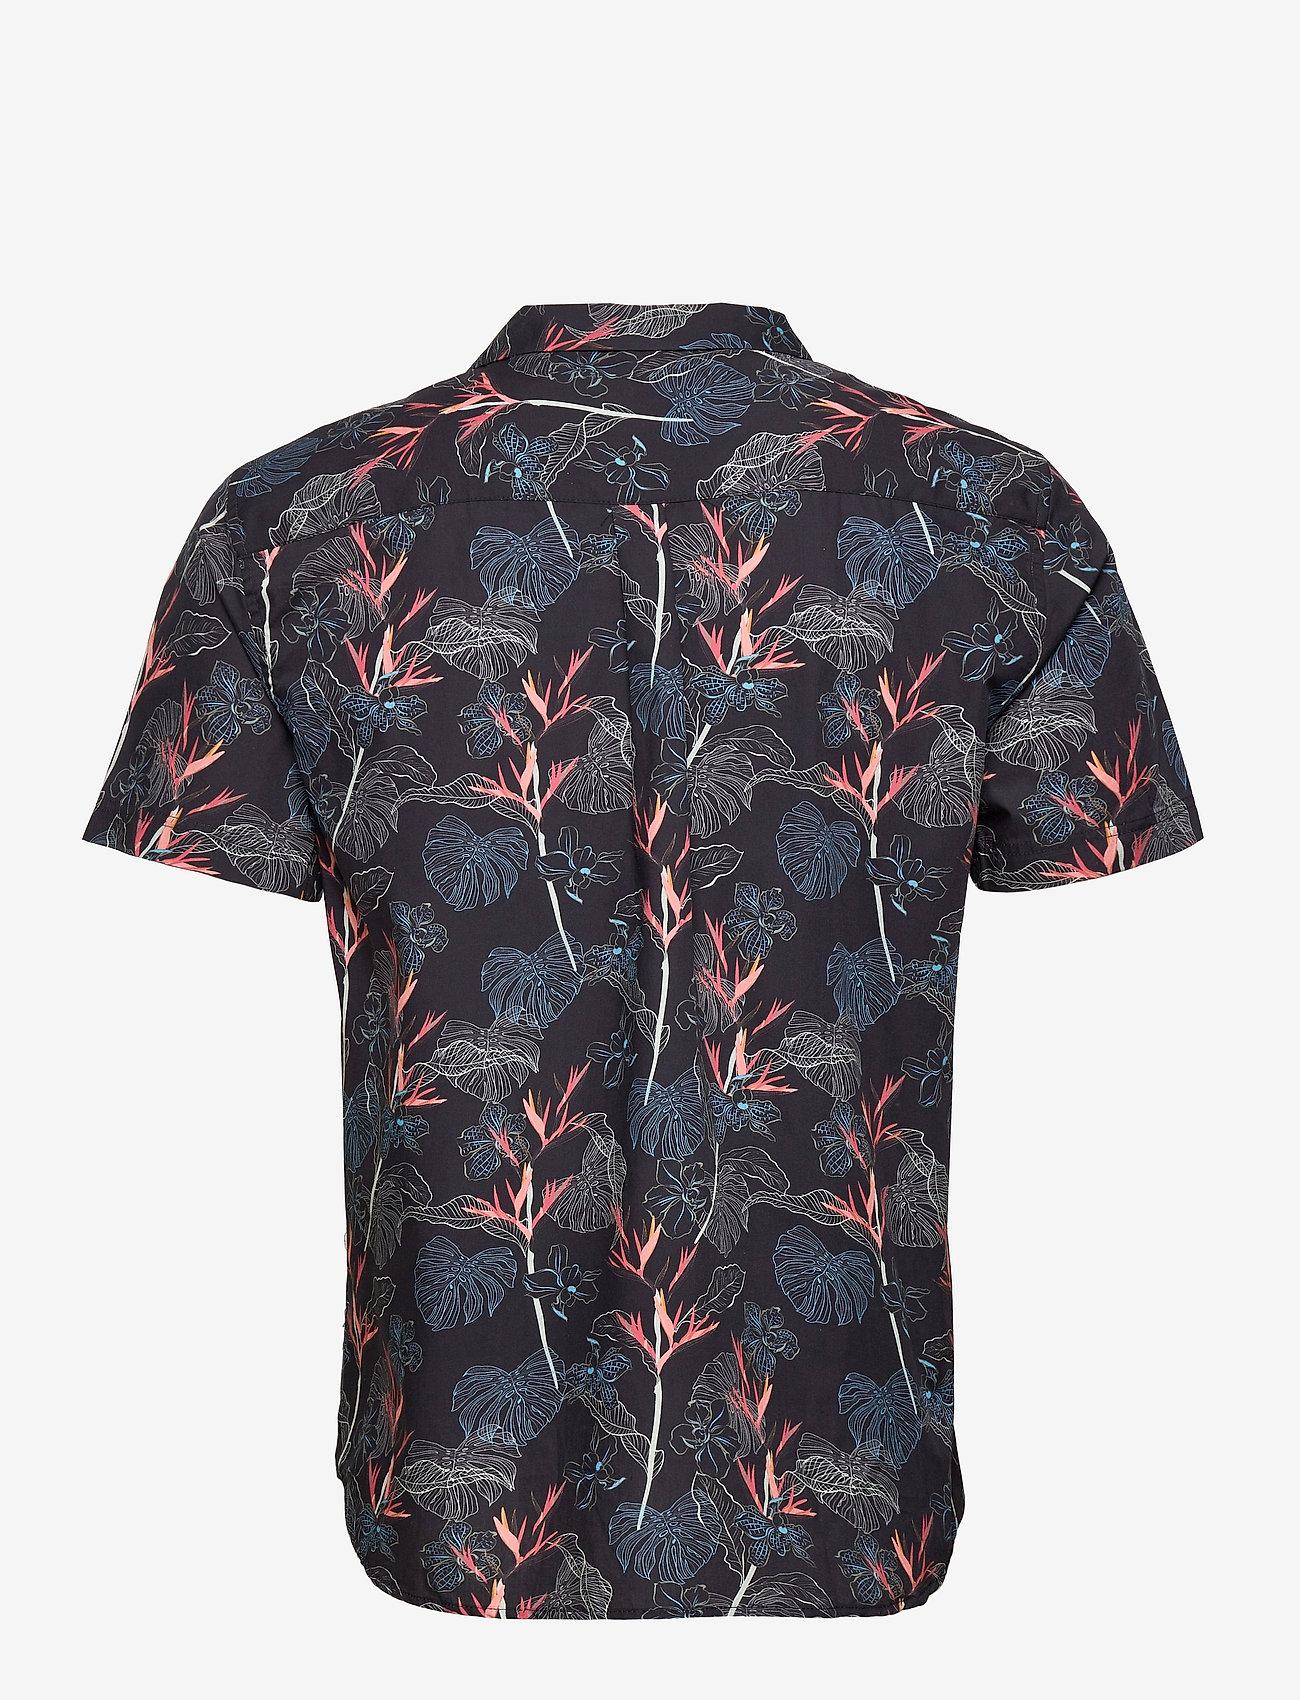 Anerkjendt - AKLEO SS POPLIN AOP - chemises de lin - incense - 2